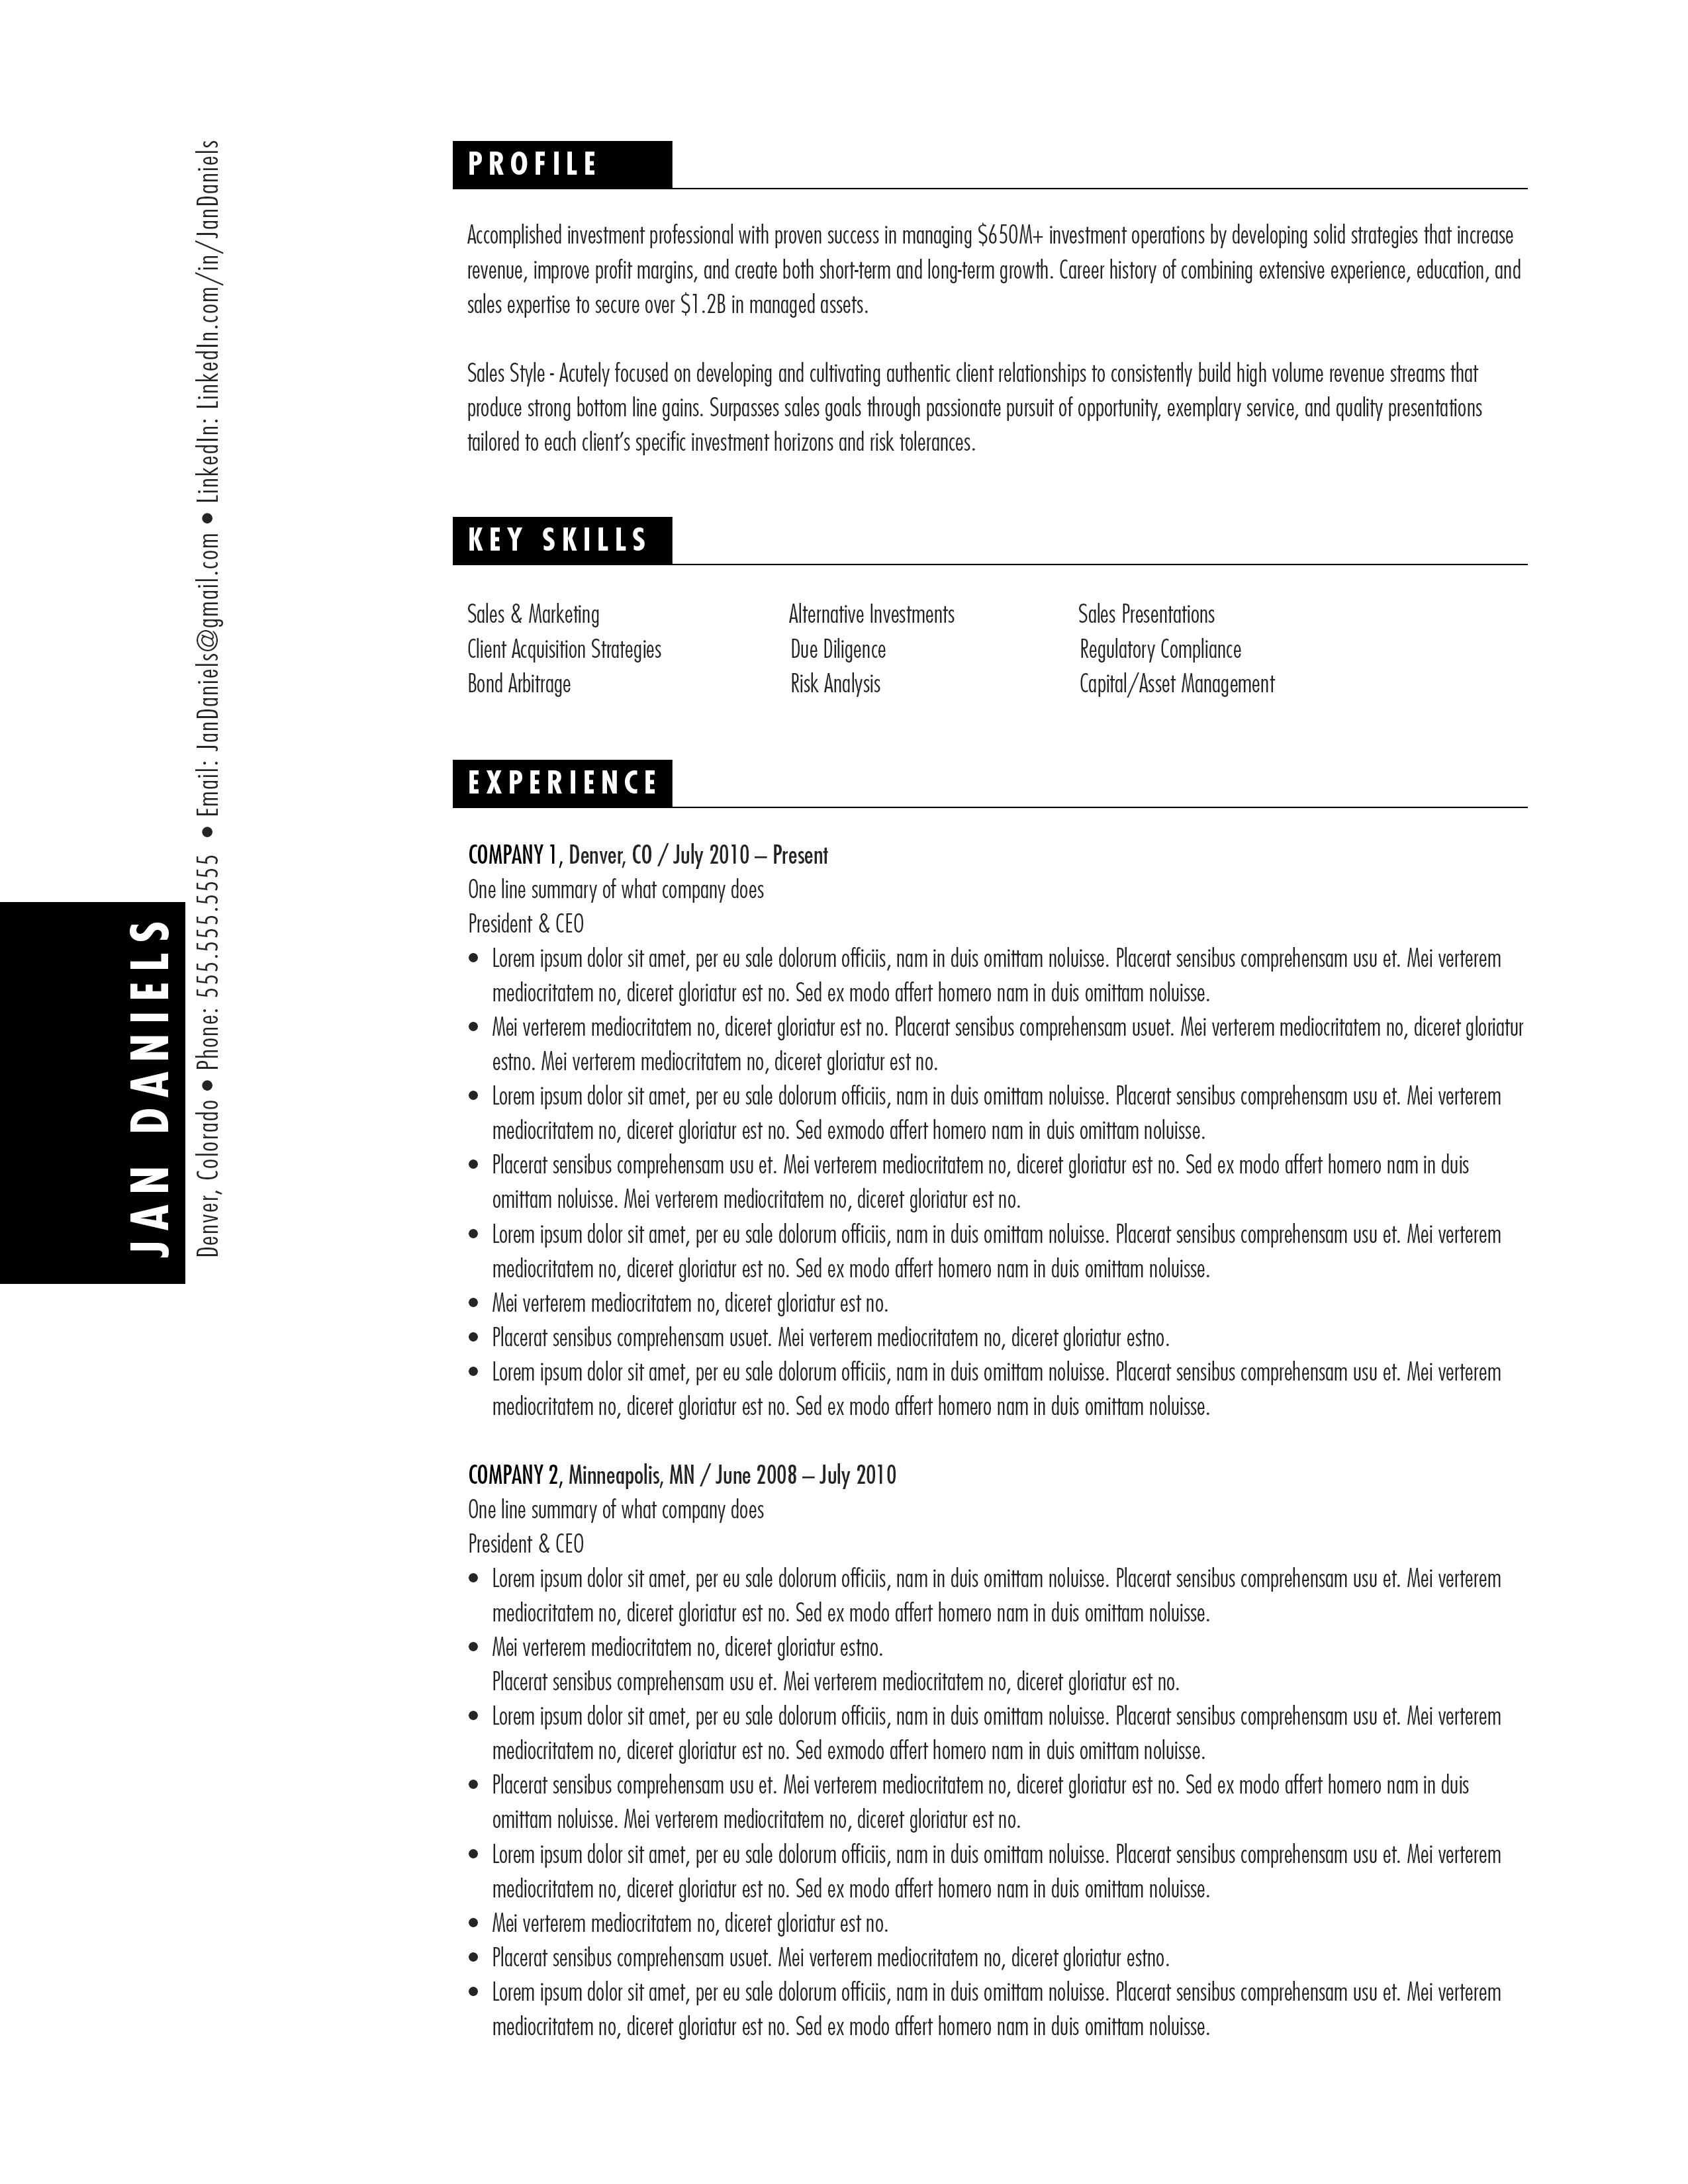 resume templates  u0026 writing  u2013 resume yeti